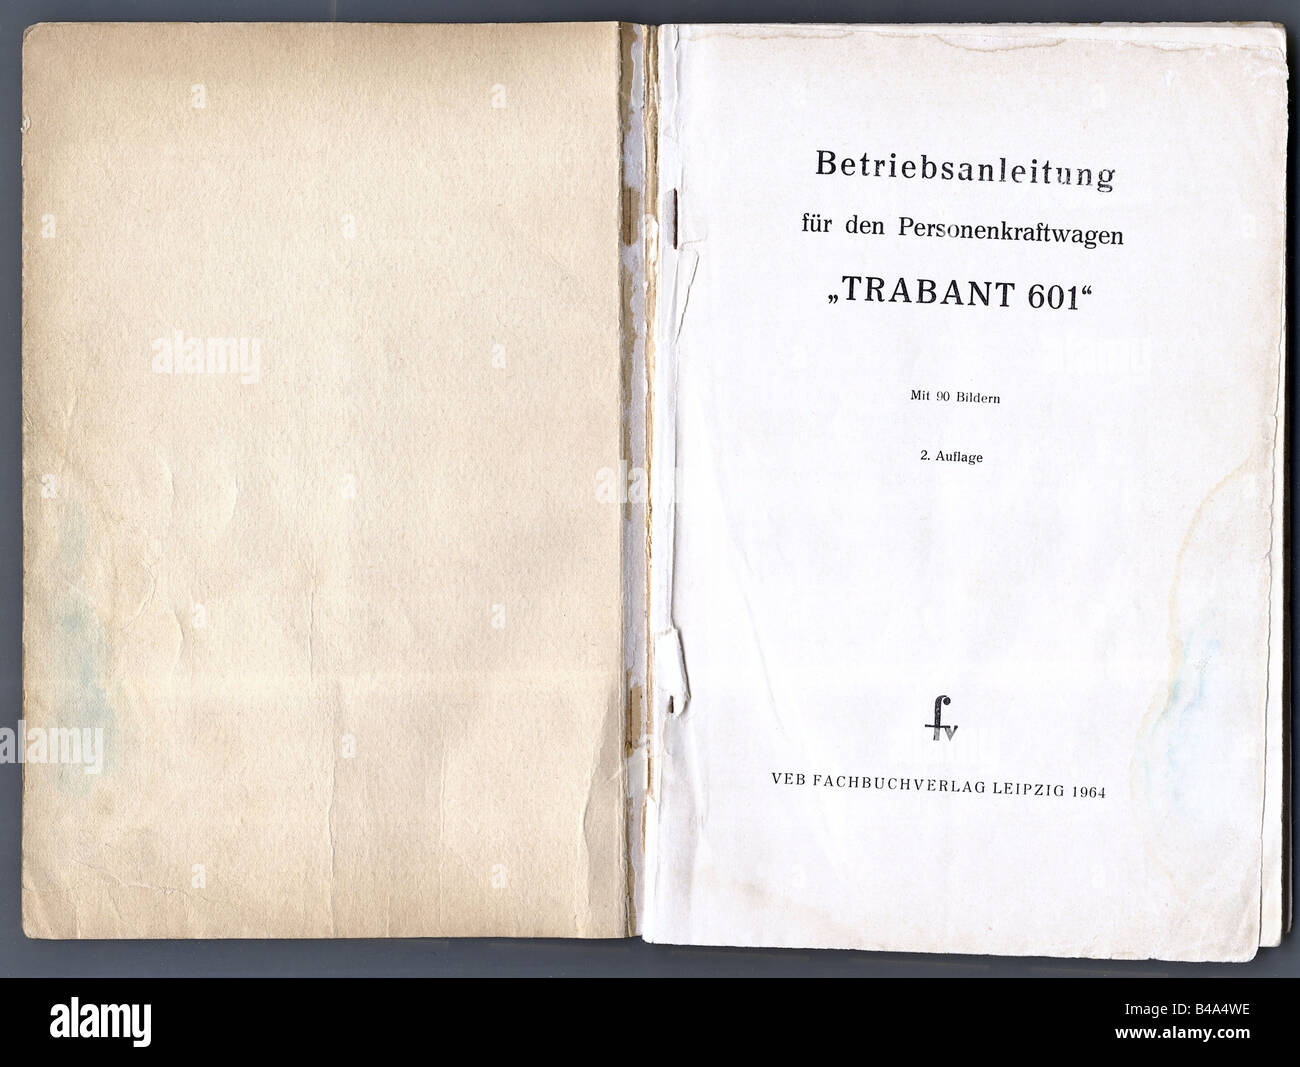 Trasporto/ trasporto, automobili, Germania, Trabant 601, istruzione manualof VEB Sachsenring Automobilwerke Zwickau, Immagini Stock